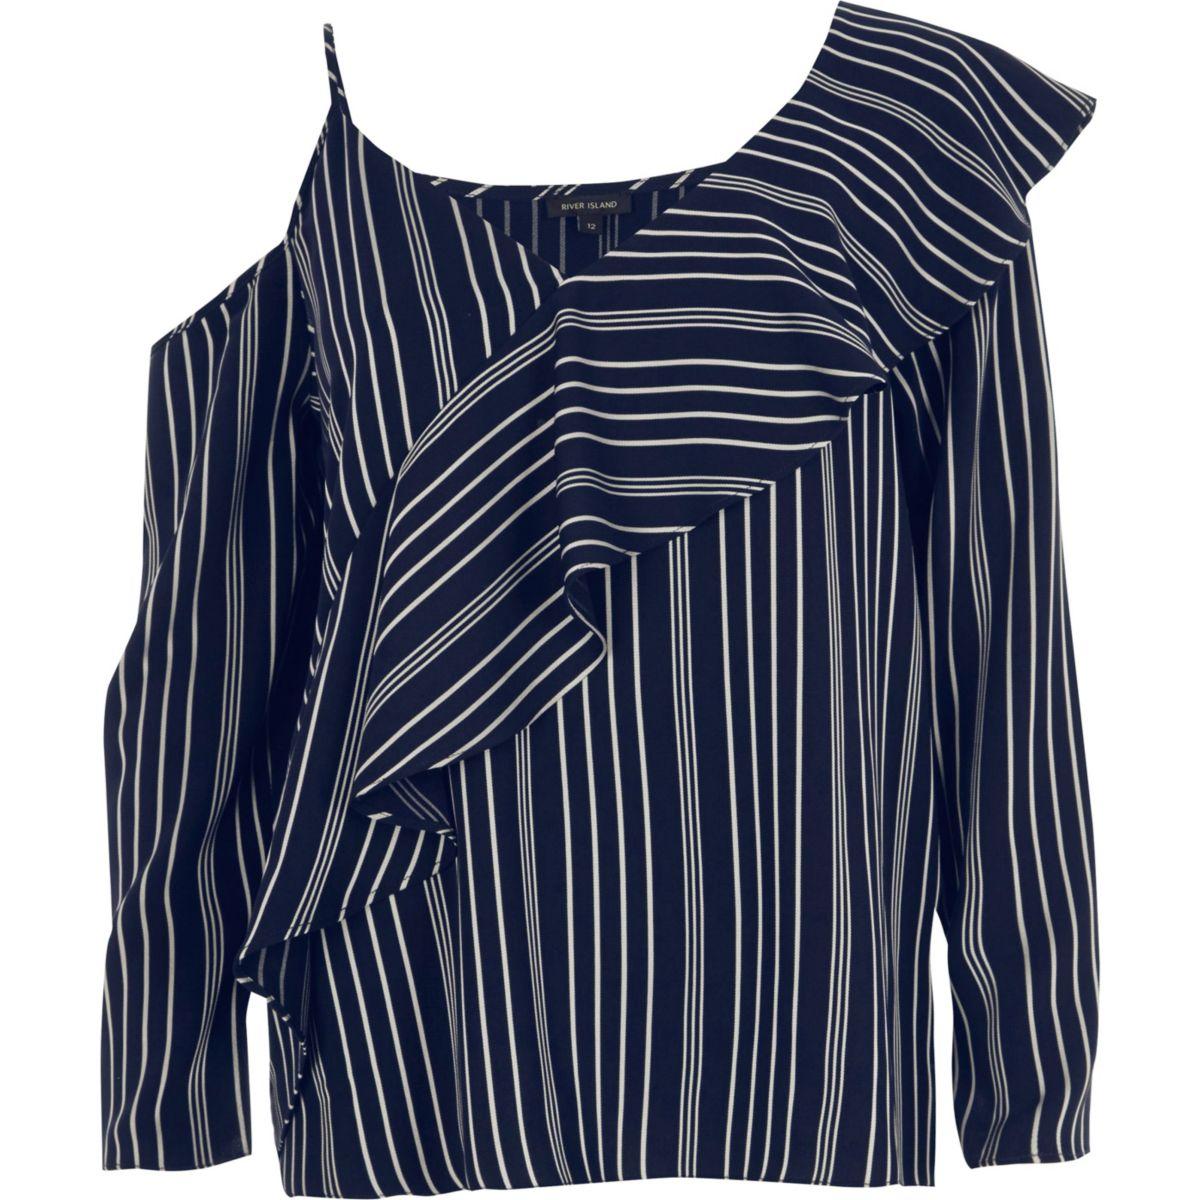 Navy stripe one shoulder frill top